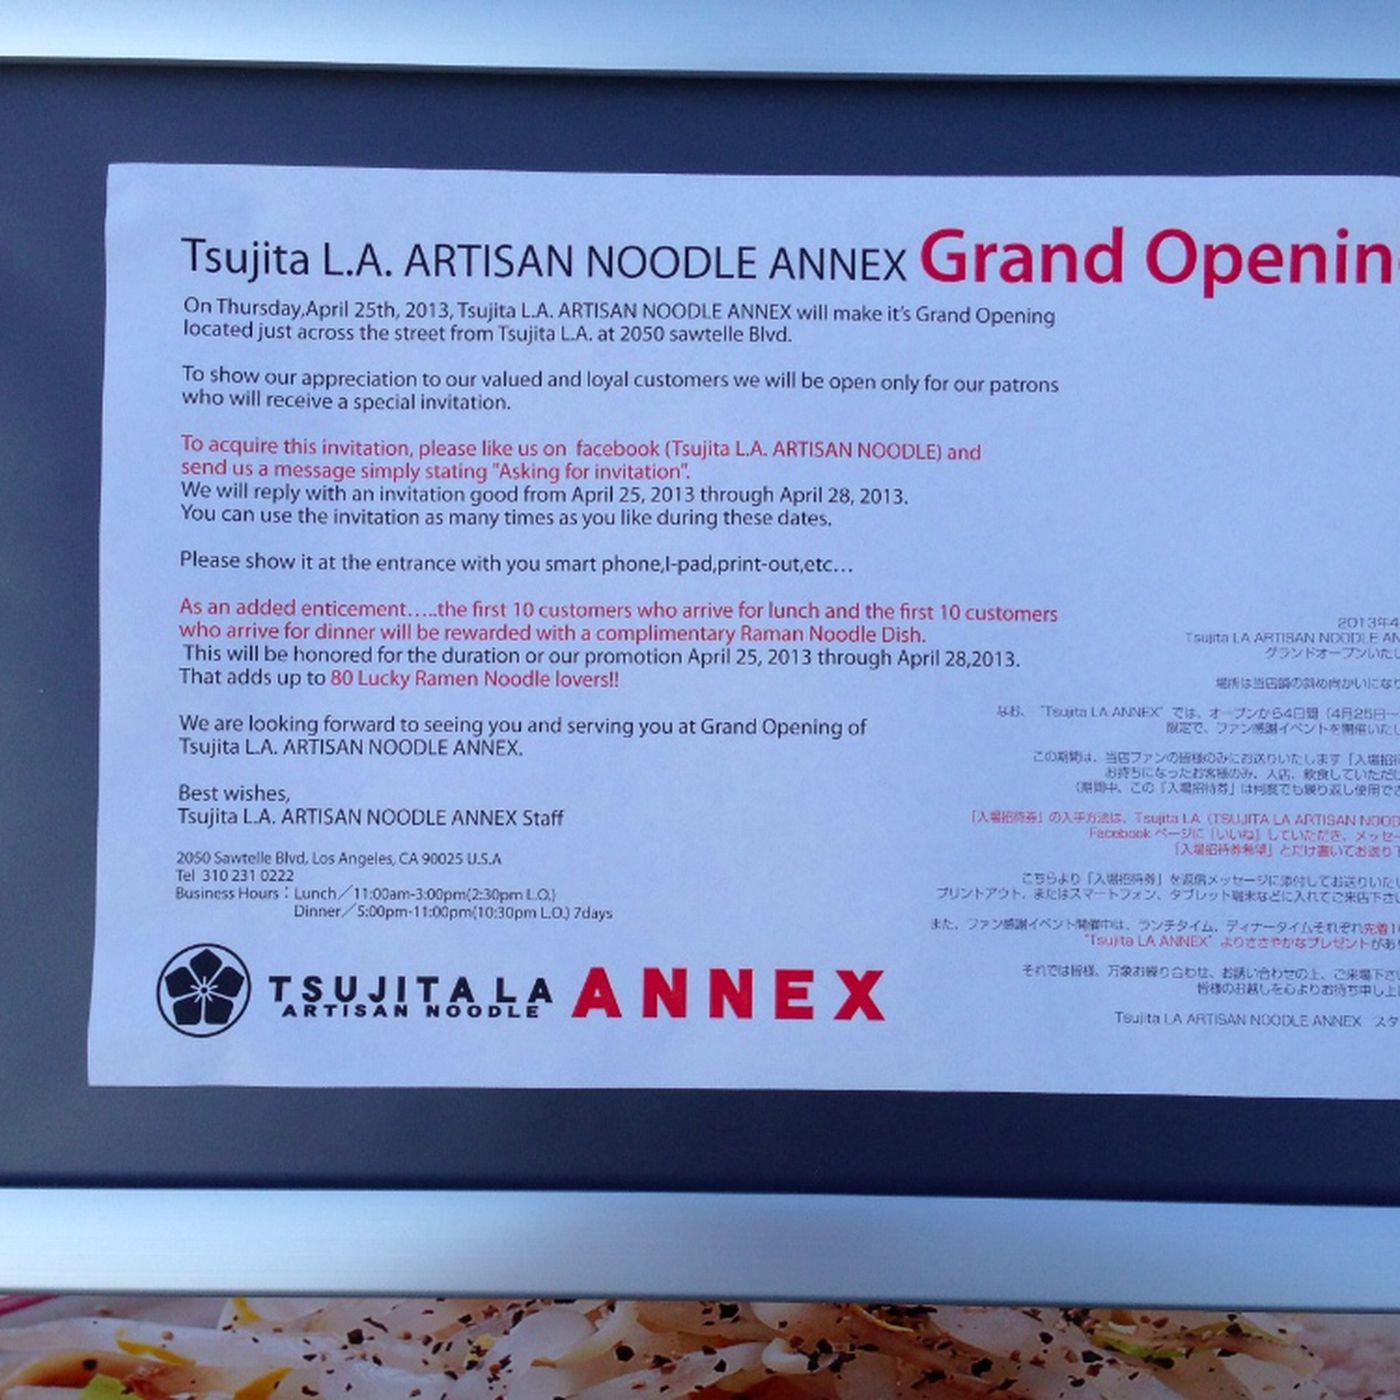 Tsujita L A  Artisan Noodle ANNEX Opens April 25 - Eater LA